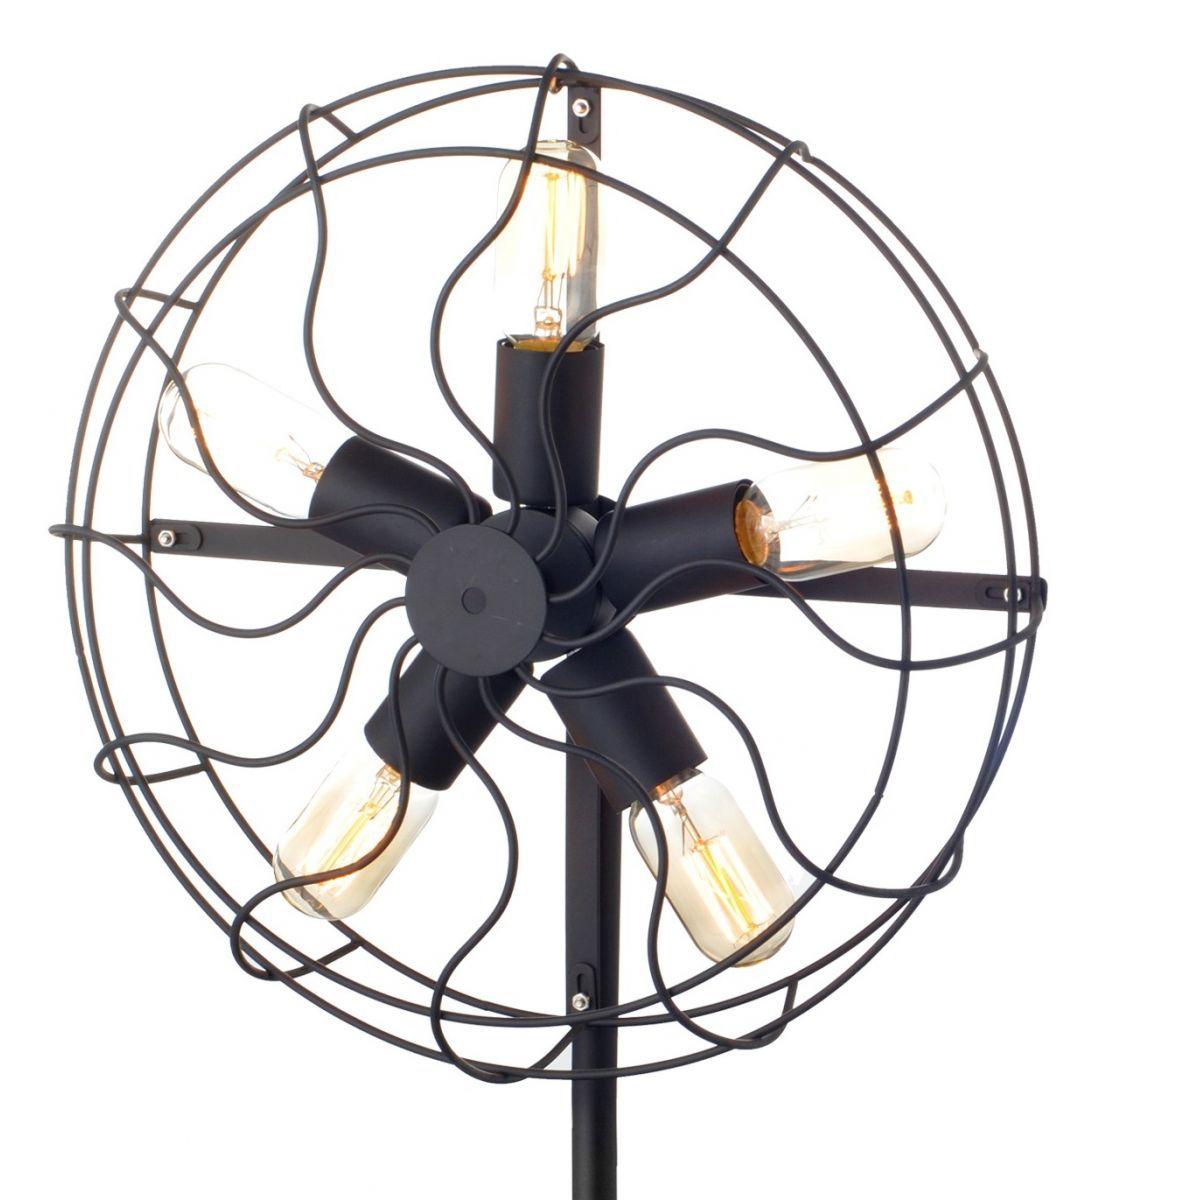 Luminária de chão Ventilador Vintage Retrô Preta Ref: Lt-271-Ch - Luxtek